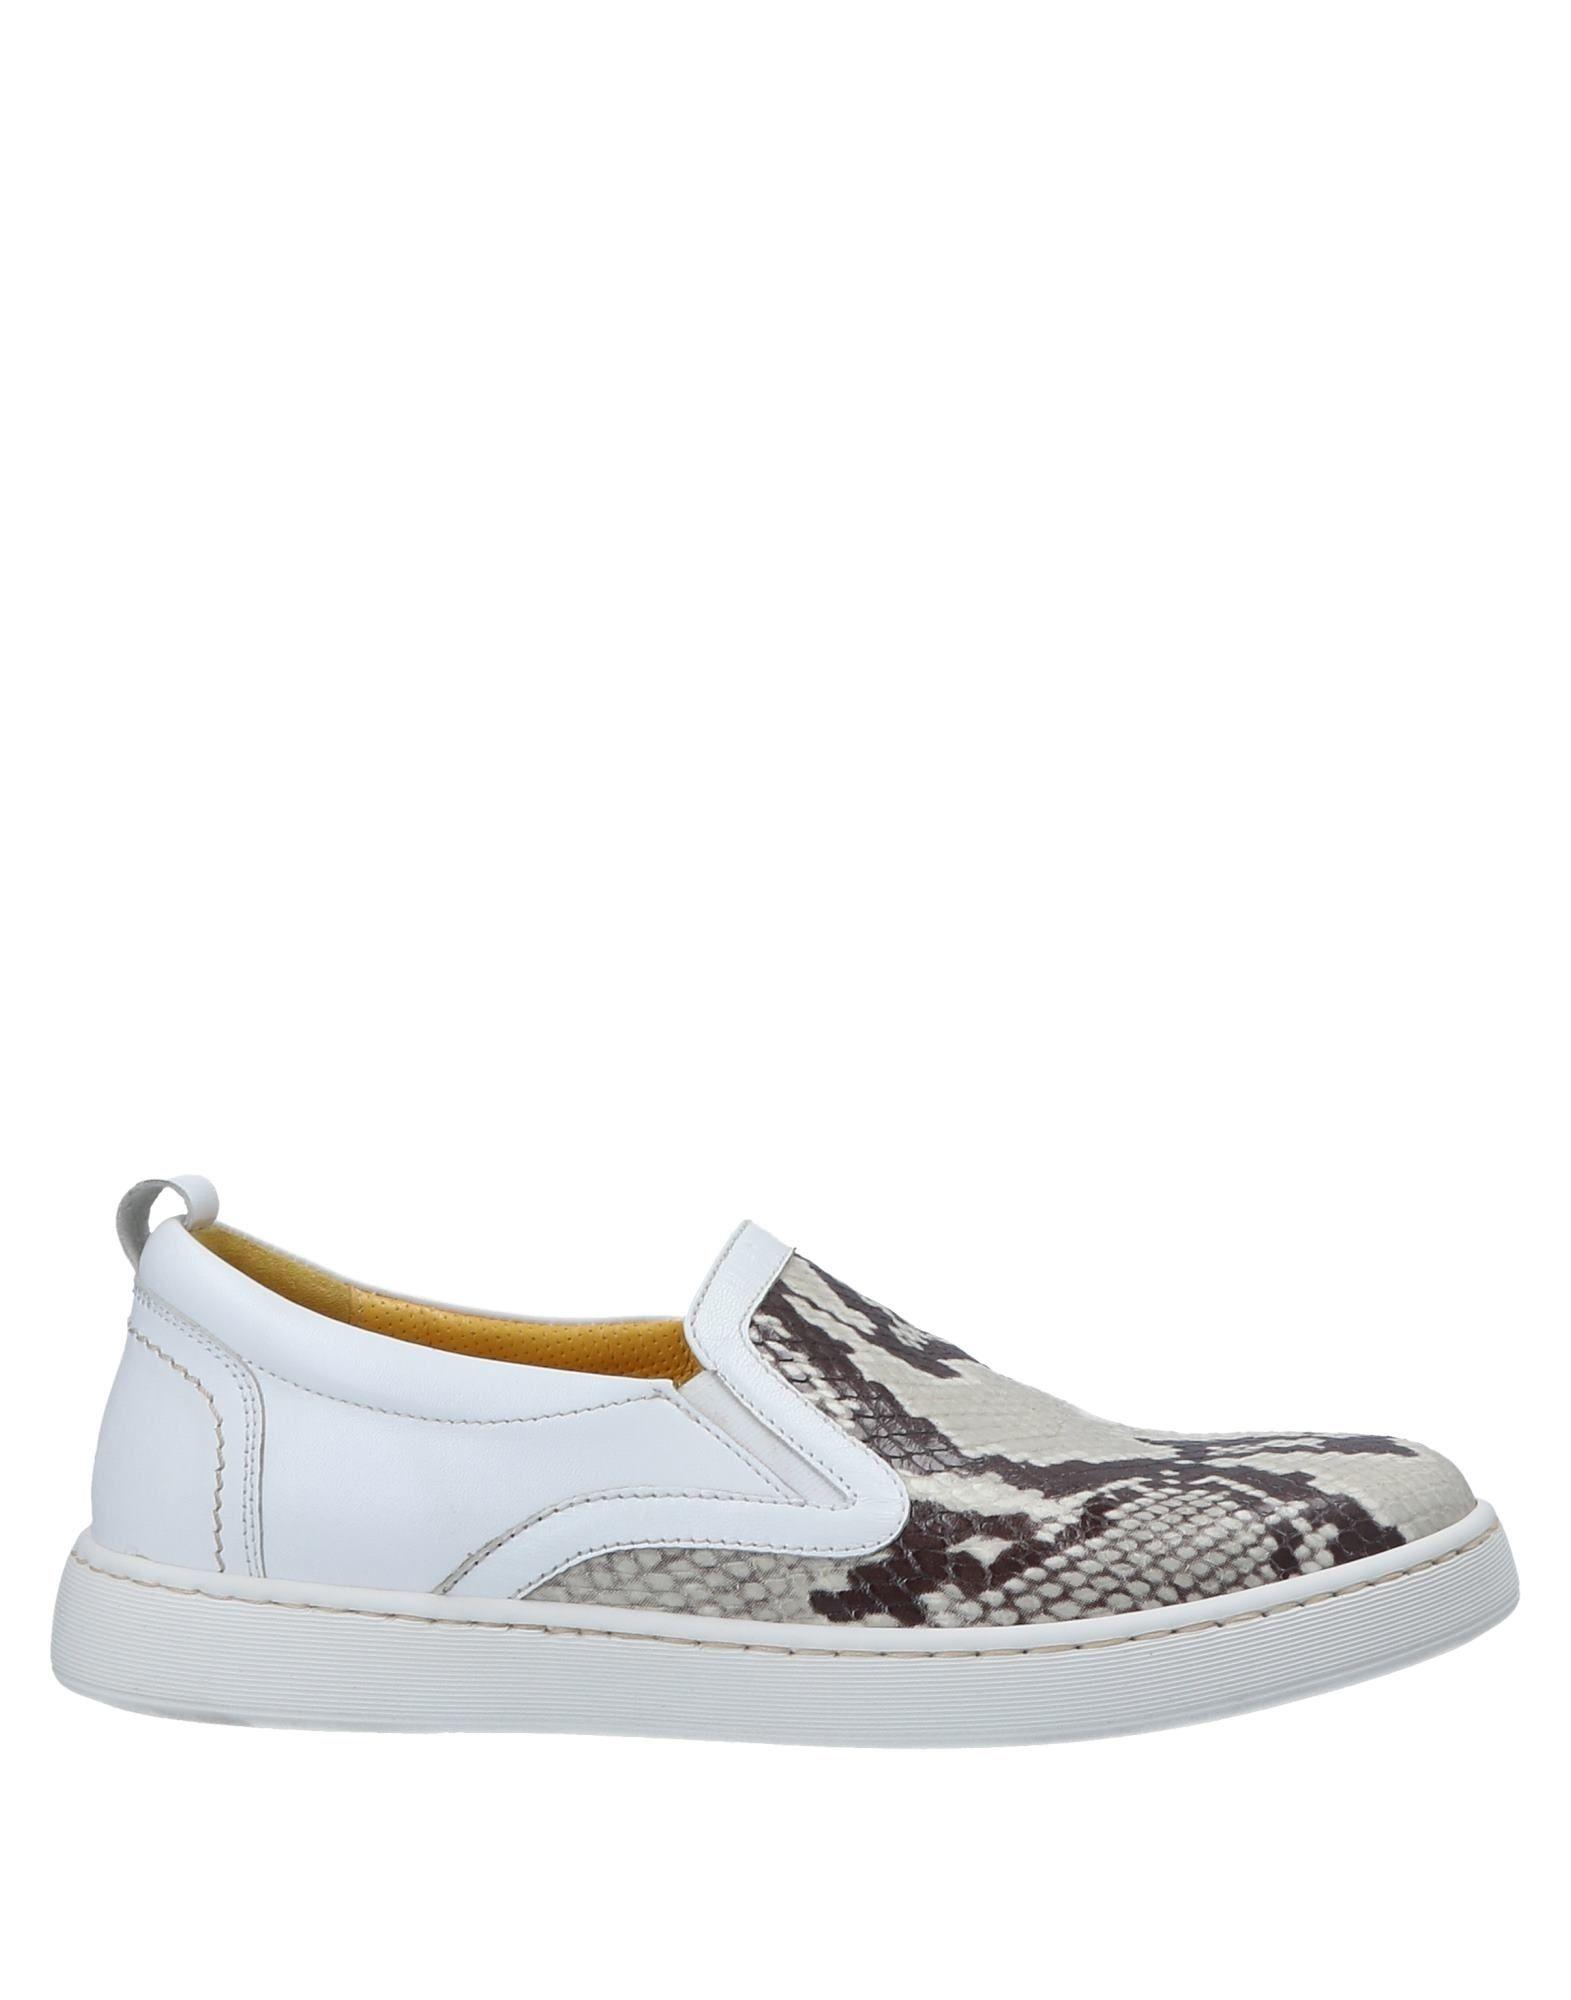 Calpierre Sneakers Gute Damen  11551406LW Gute Sneakers Qualität beliebte Schuhe 5736f1